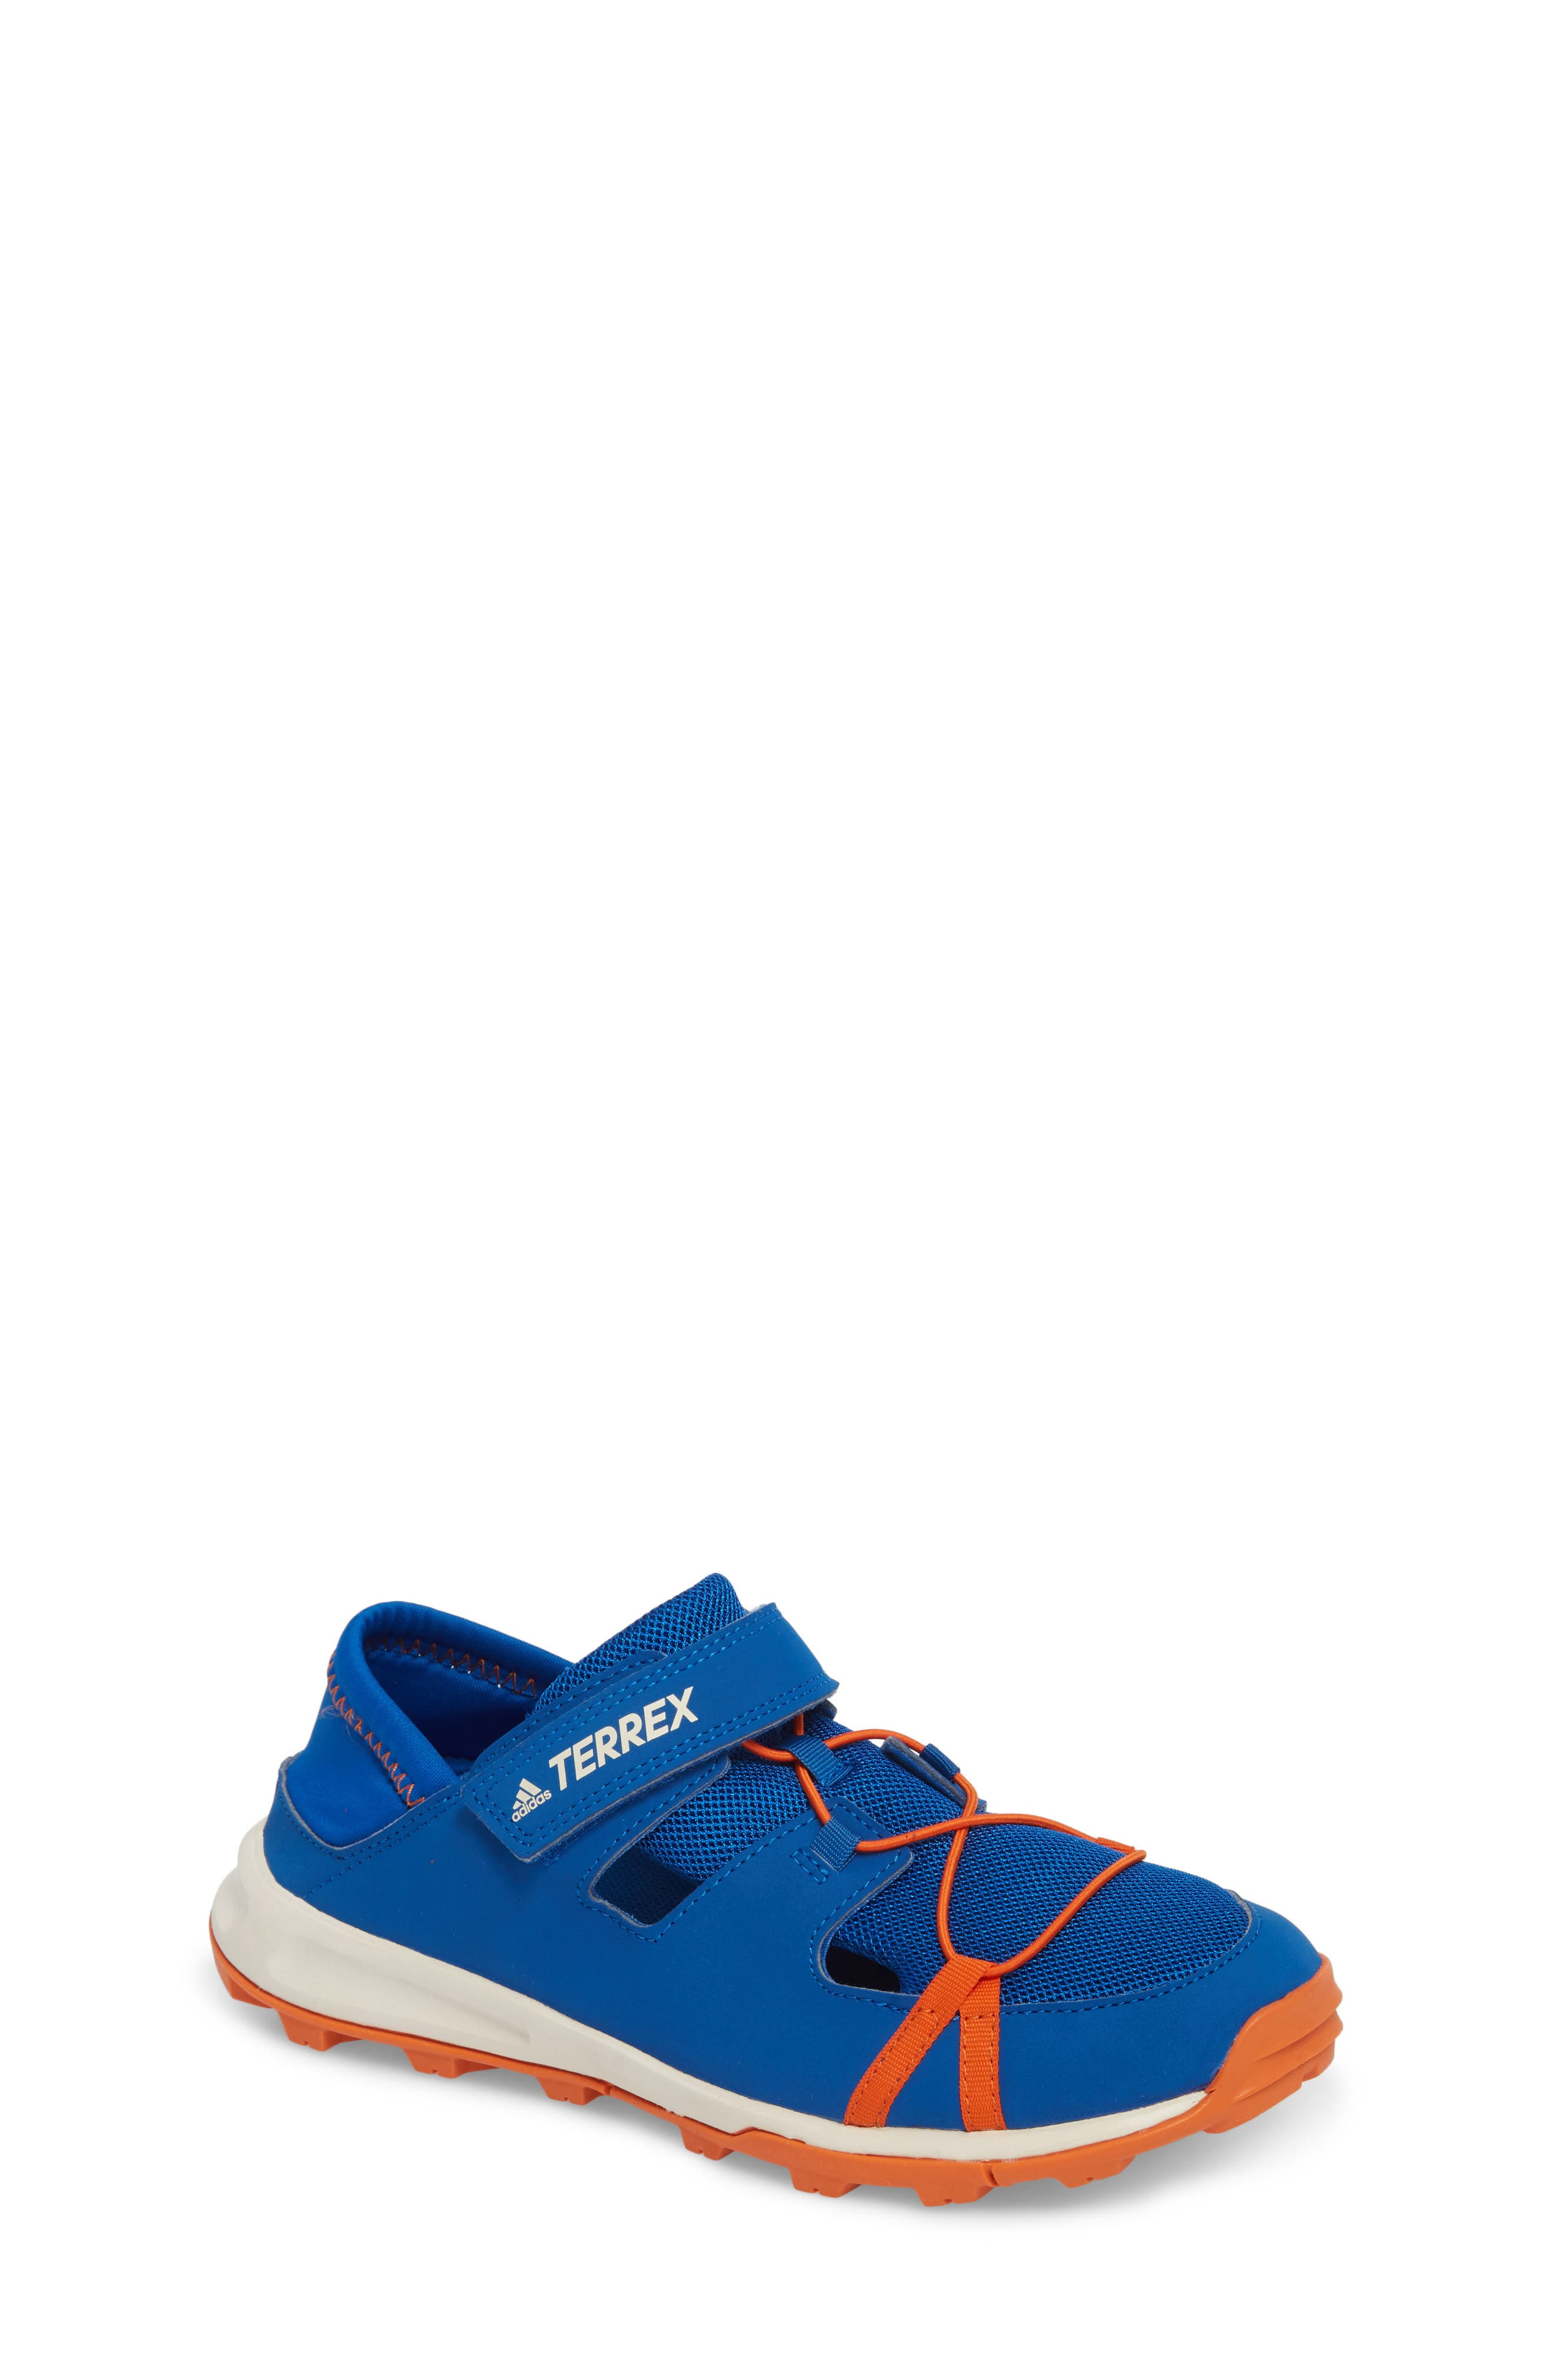 Terrex Tivid Sneaker,                         Main,                         color, Blue/ Orange/ Chalk White